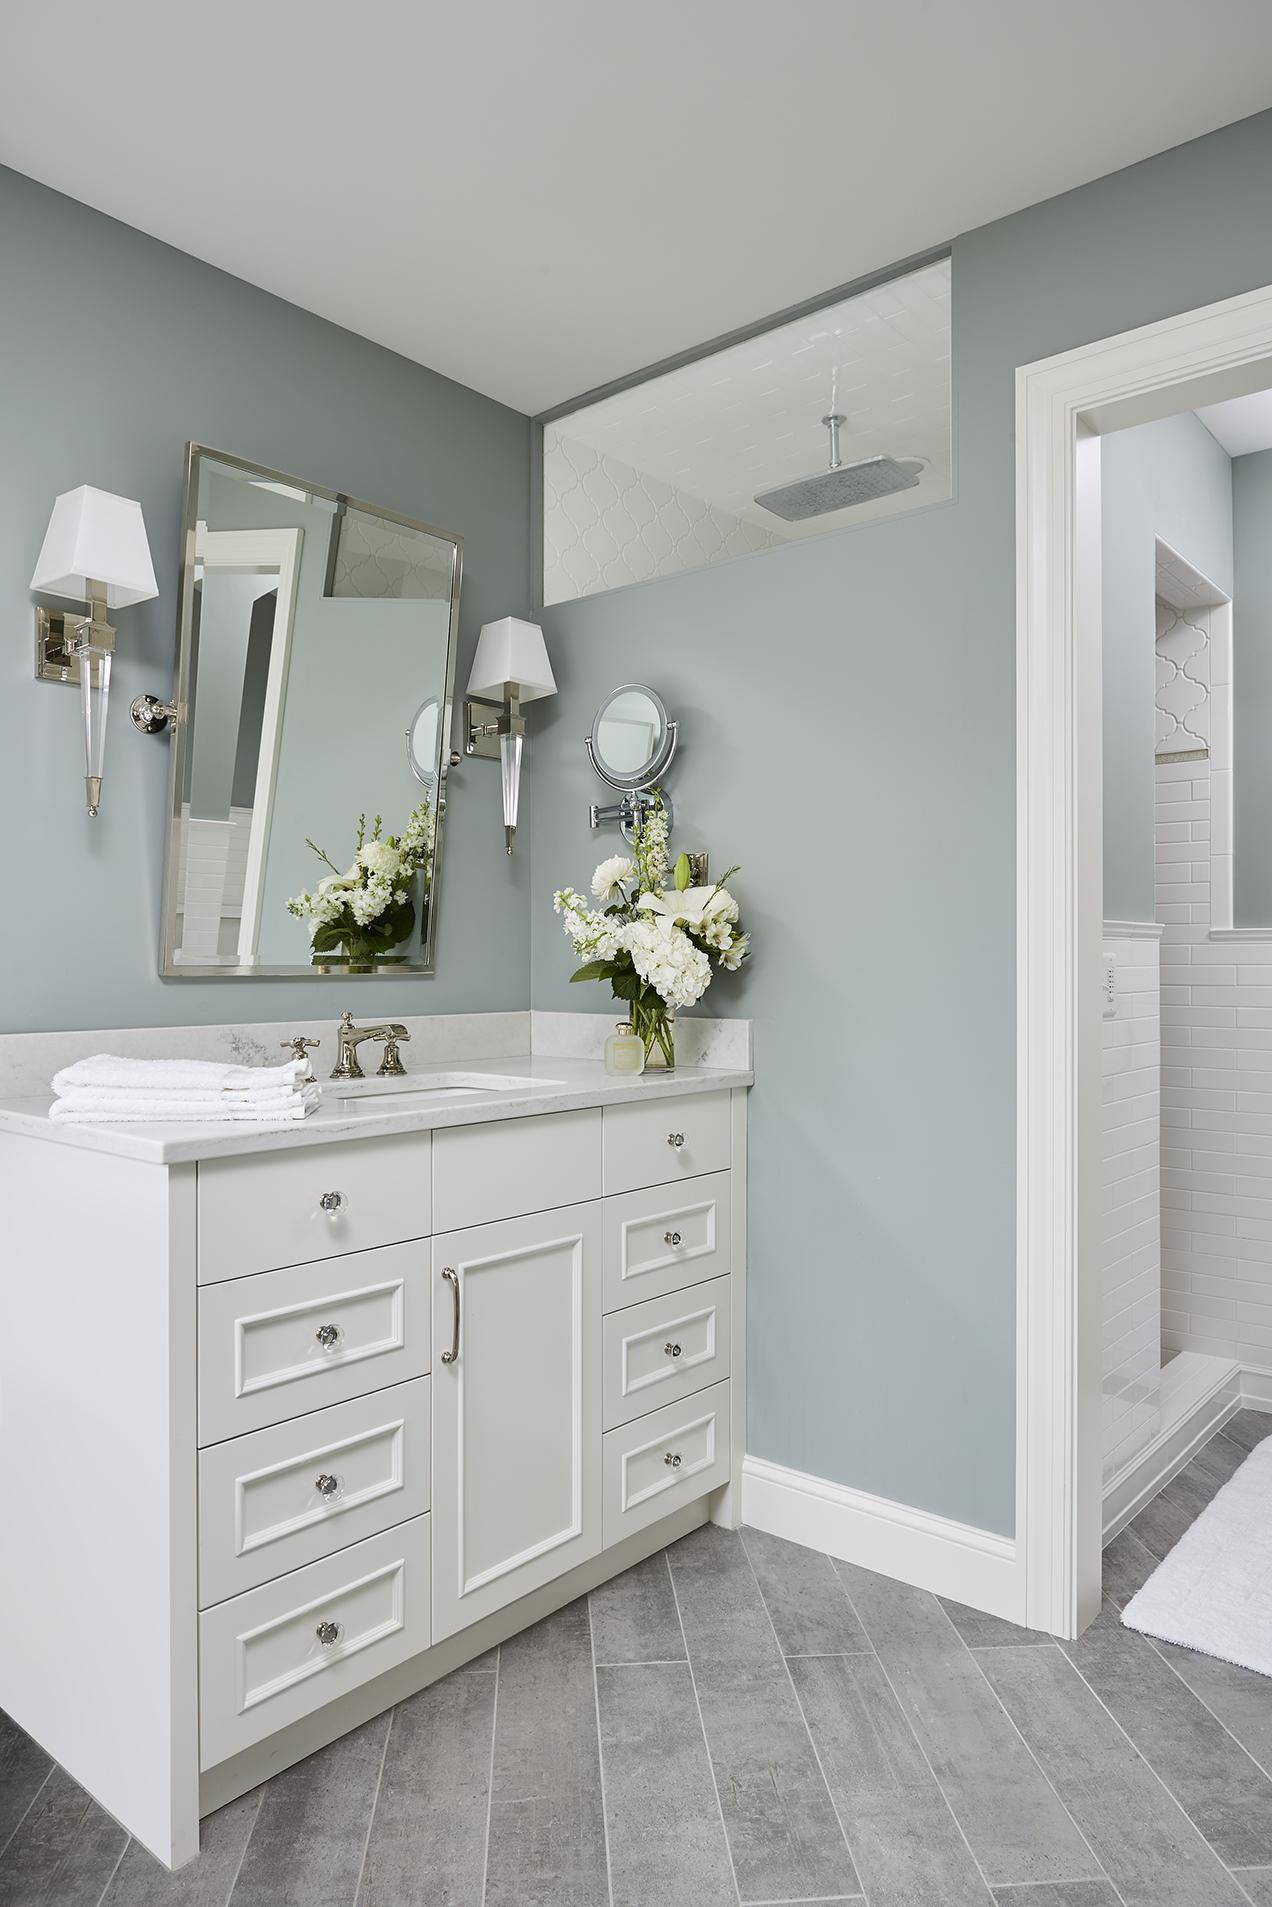 suite-gray-tile-shower-window.jpg